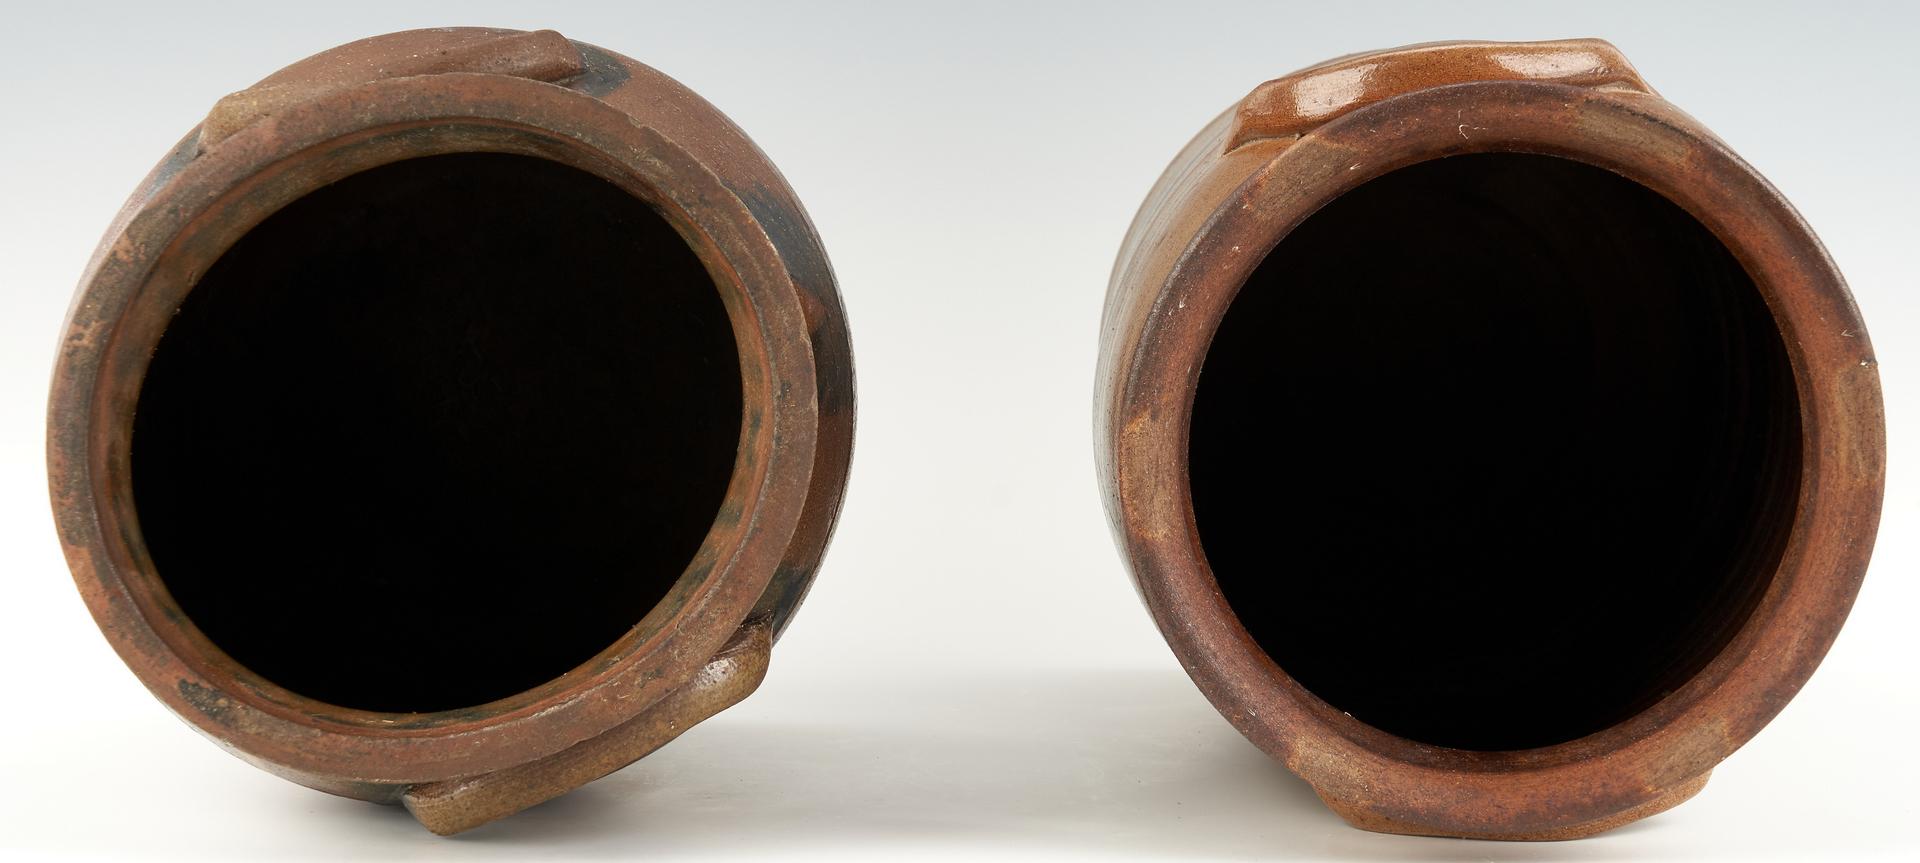 Lot 457: 2 Cobalt Decorated Stoneware Jars, Poss. SW VA